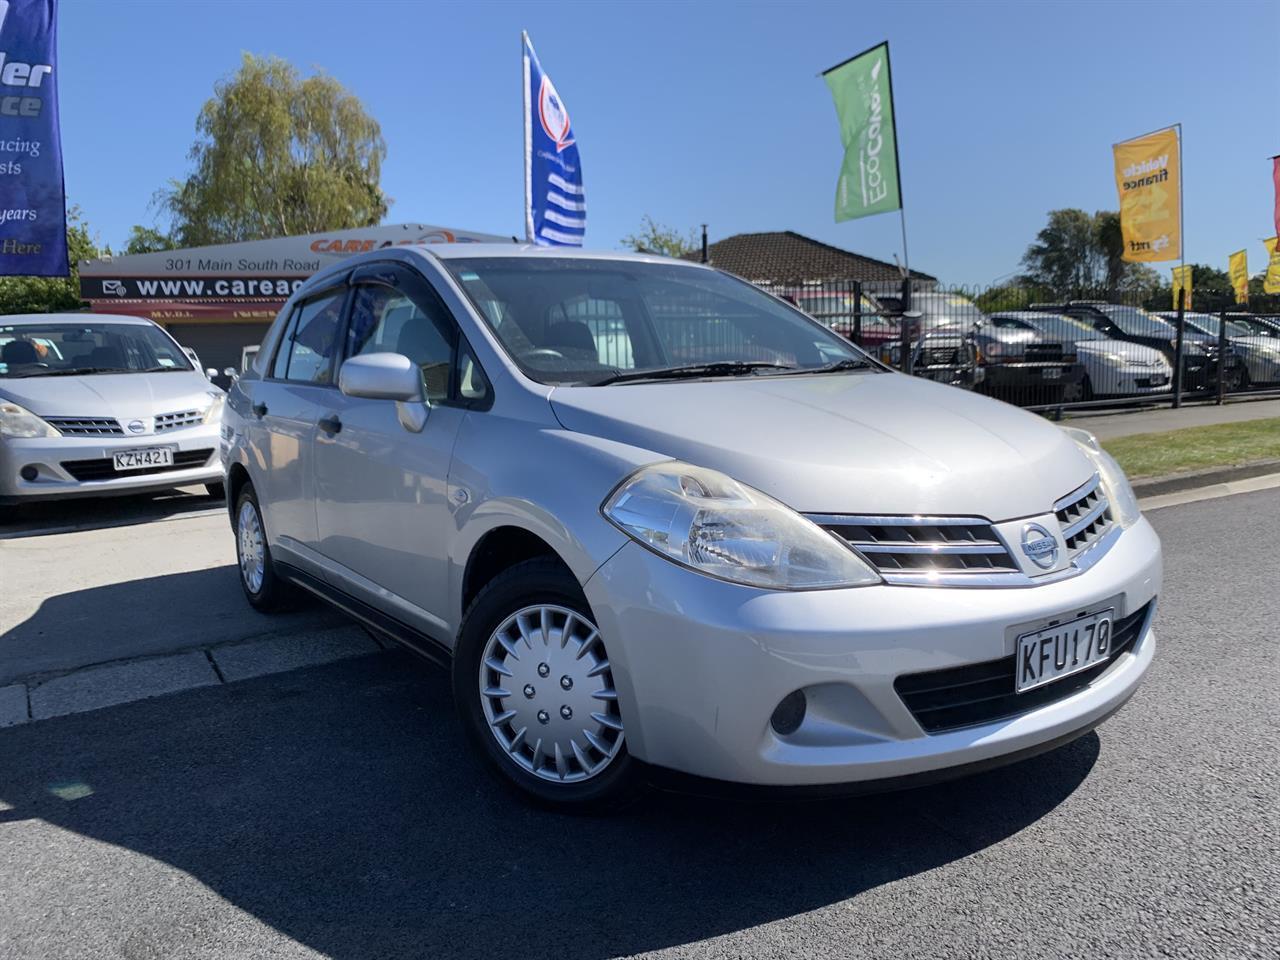 image-0, 2011 Nissan Tiida LATIO SILVER SALOON at Christchurch